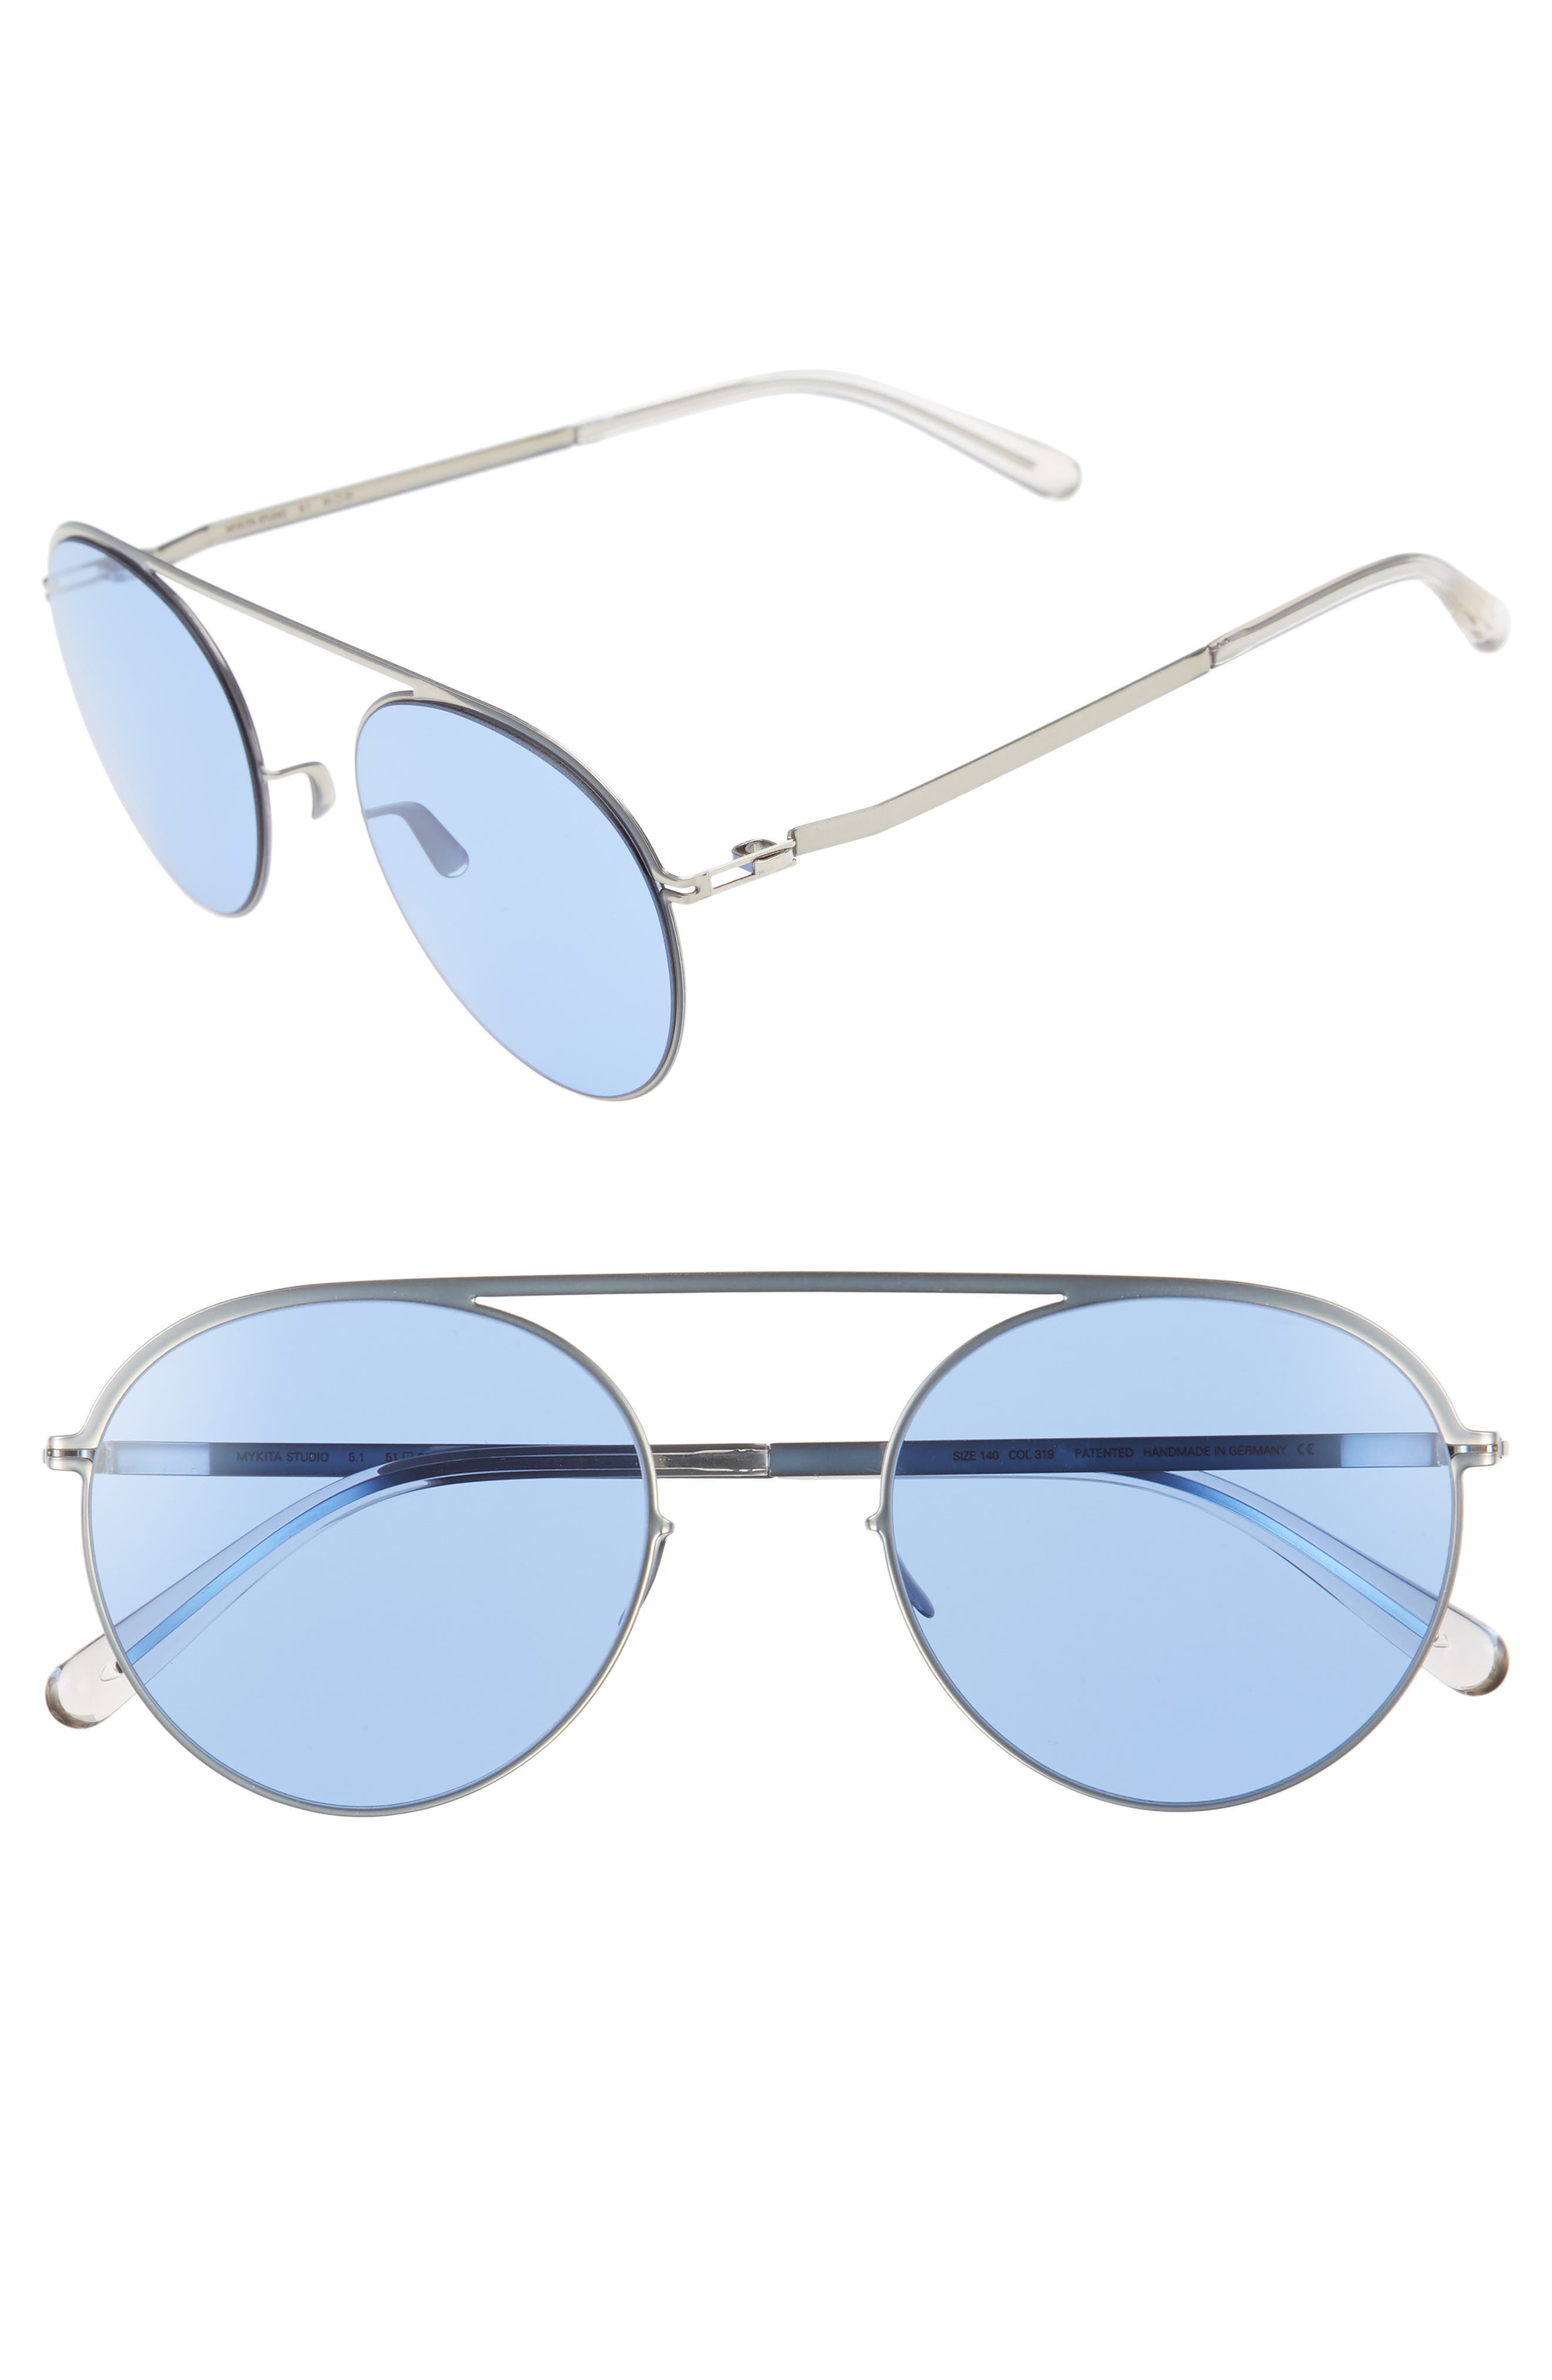 Studio 5.1 51mm Sunglasses,                         Main,                         color, 040